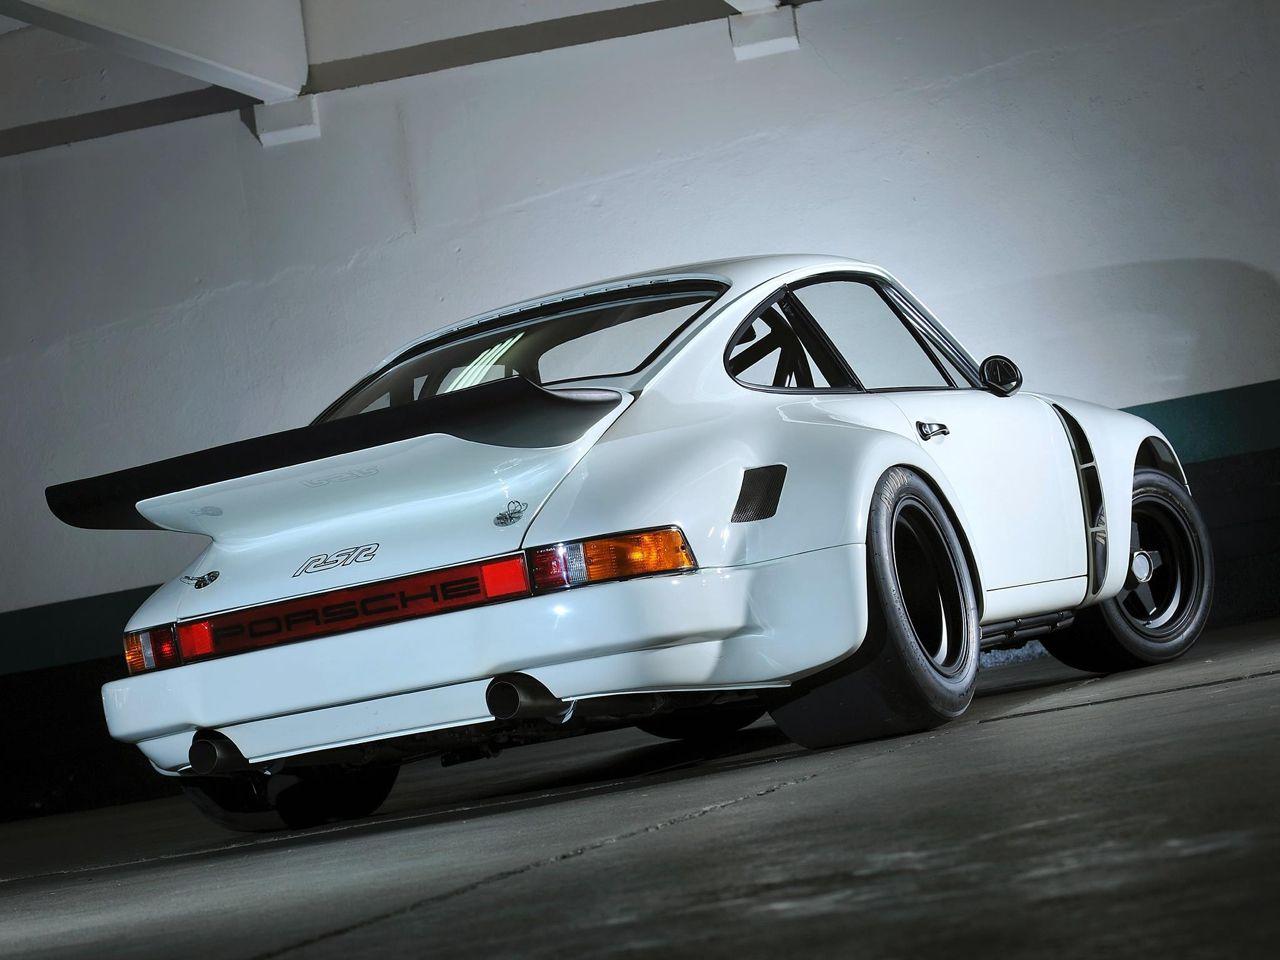 Rsr Porsche Widebody Porsche Porsche 911 Porsche Sports Cars